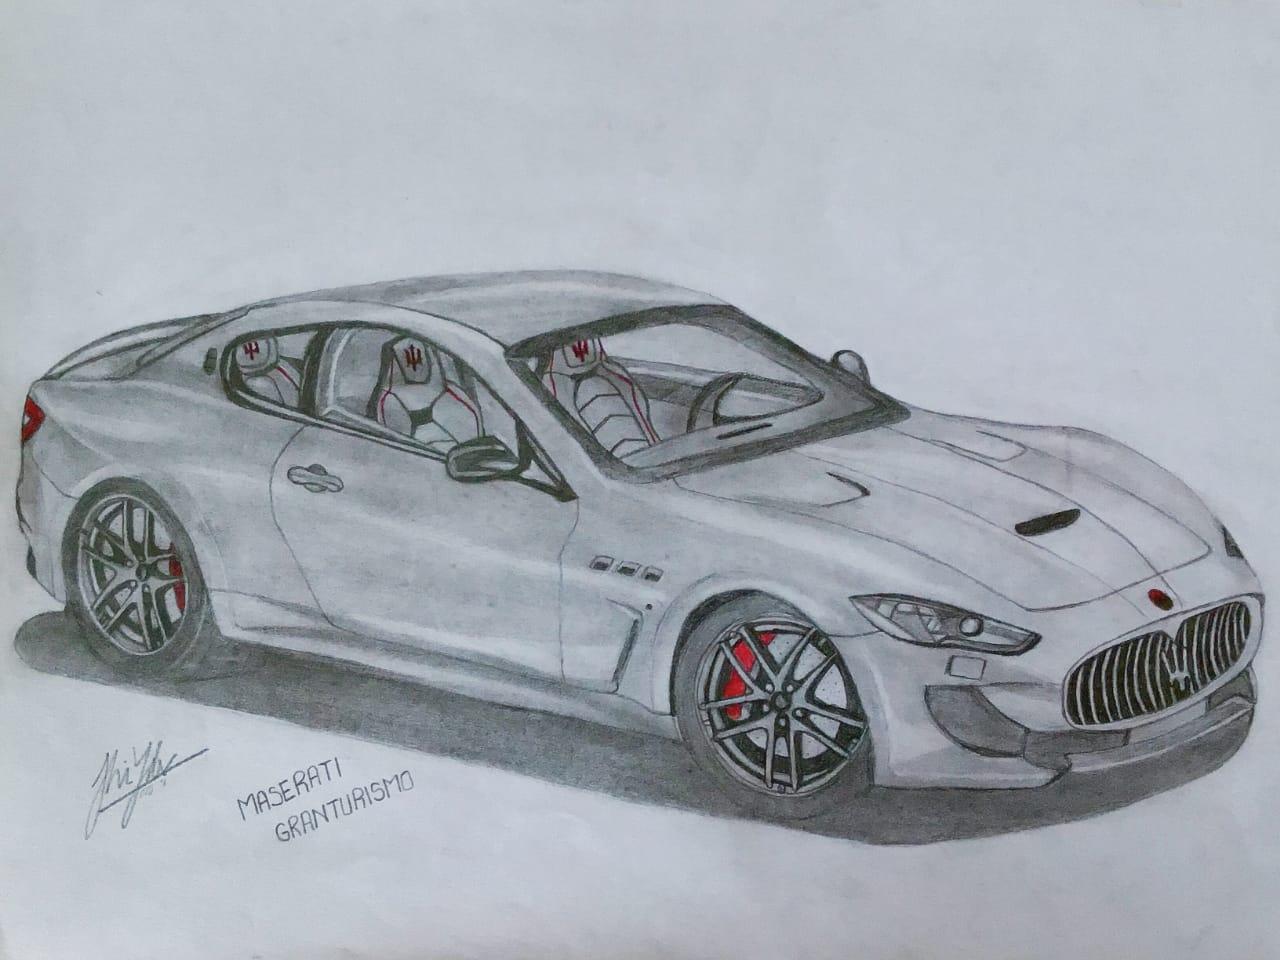 Jaanshi'a Maserati Granturismo's Sketch